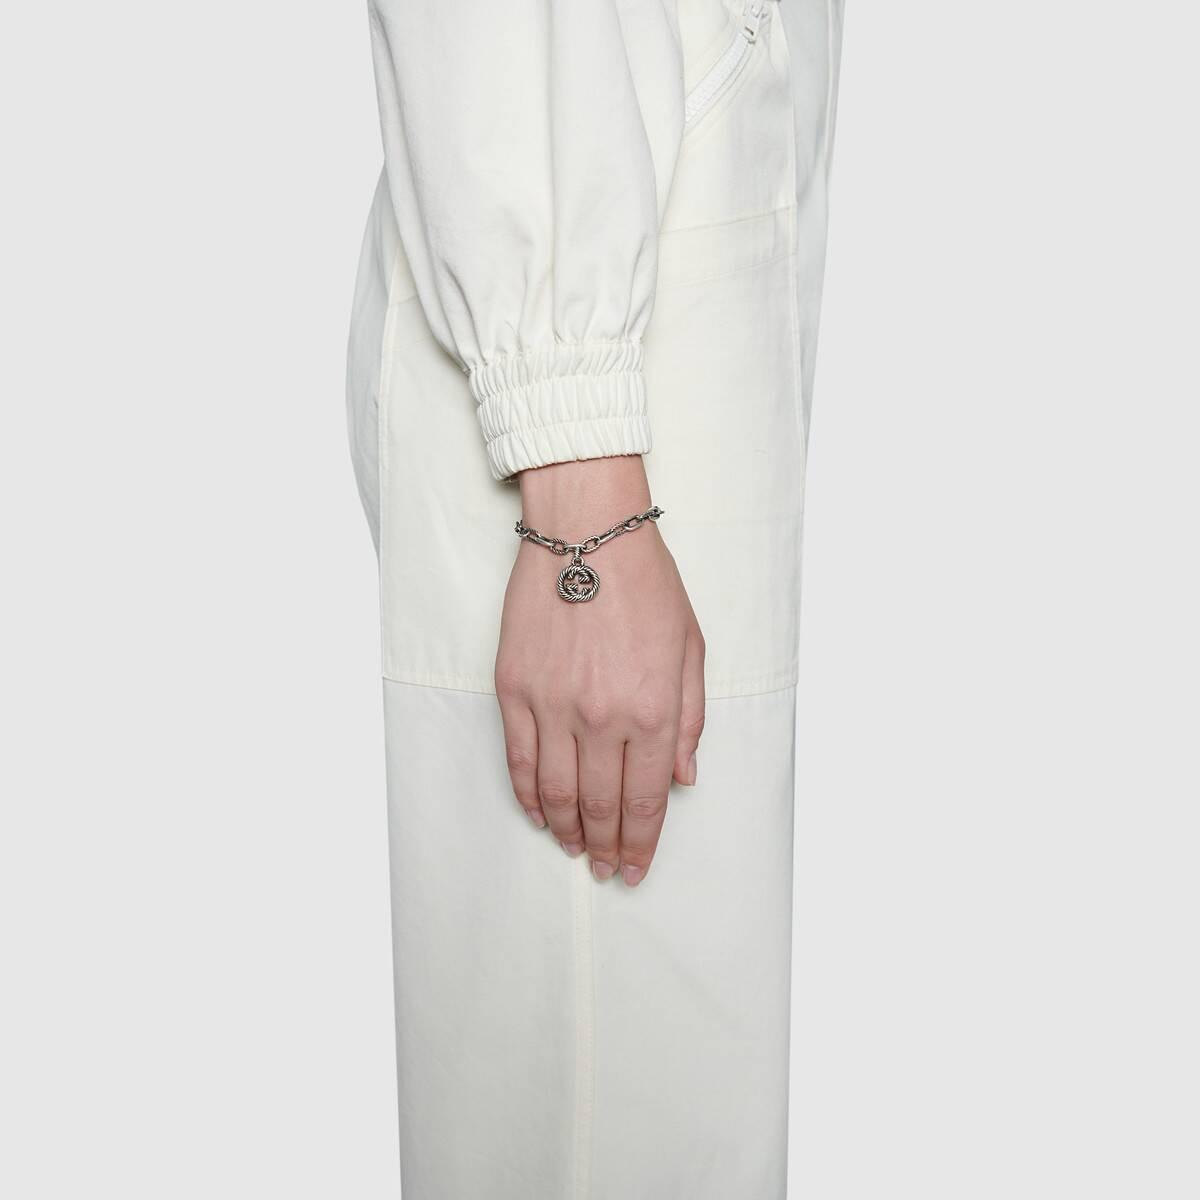 Gucci Interlocking G Charm Link Bracelet in Sterling Silver on model